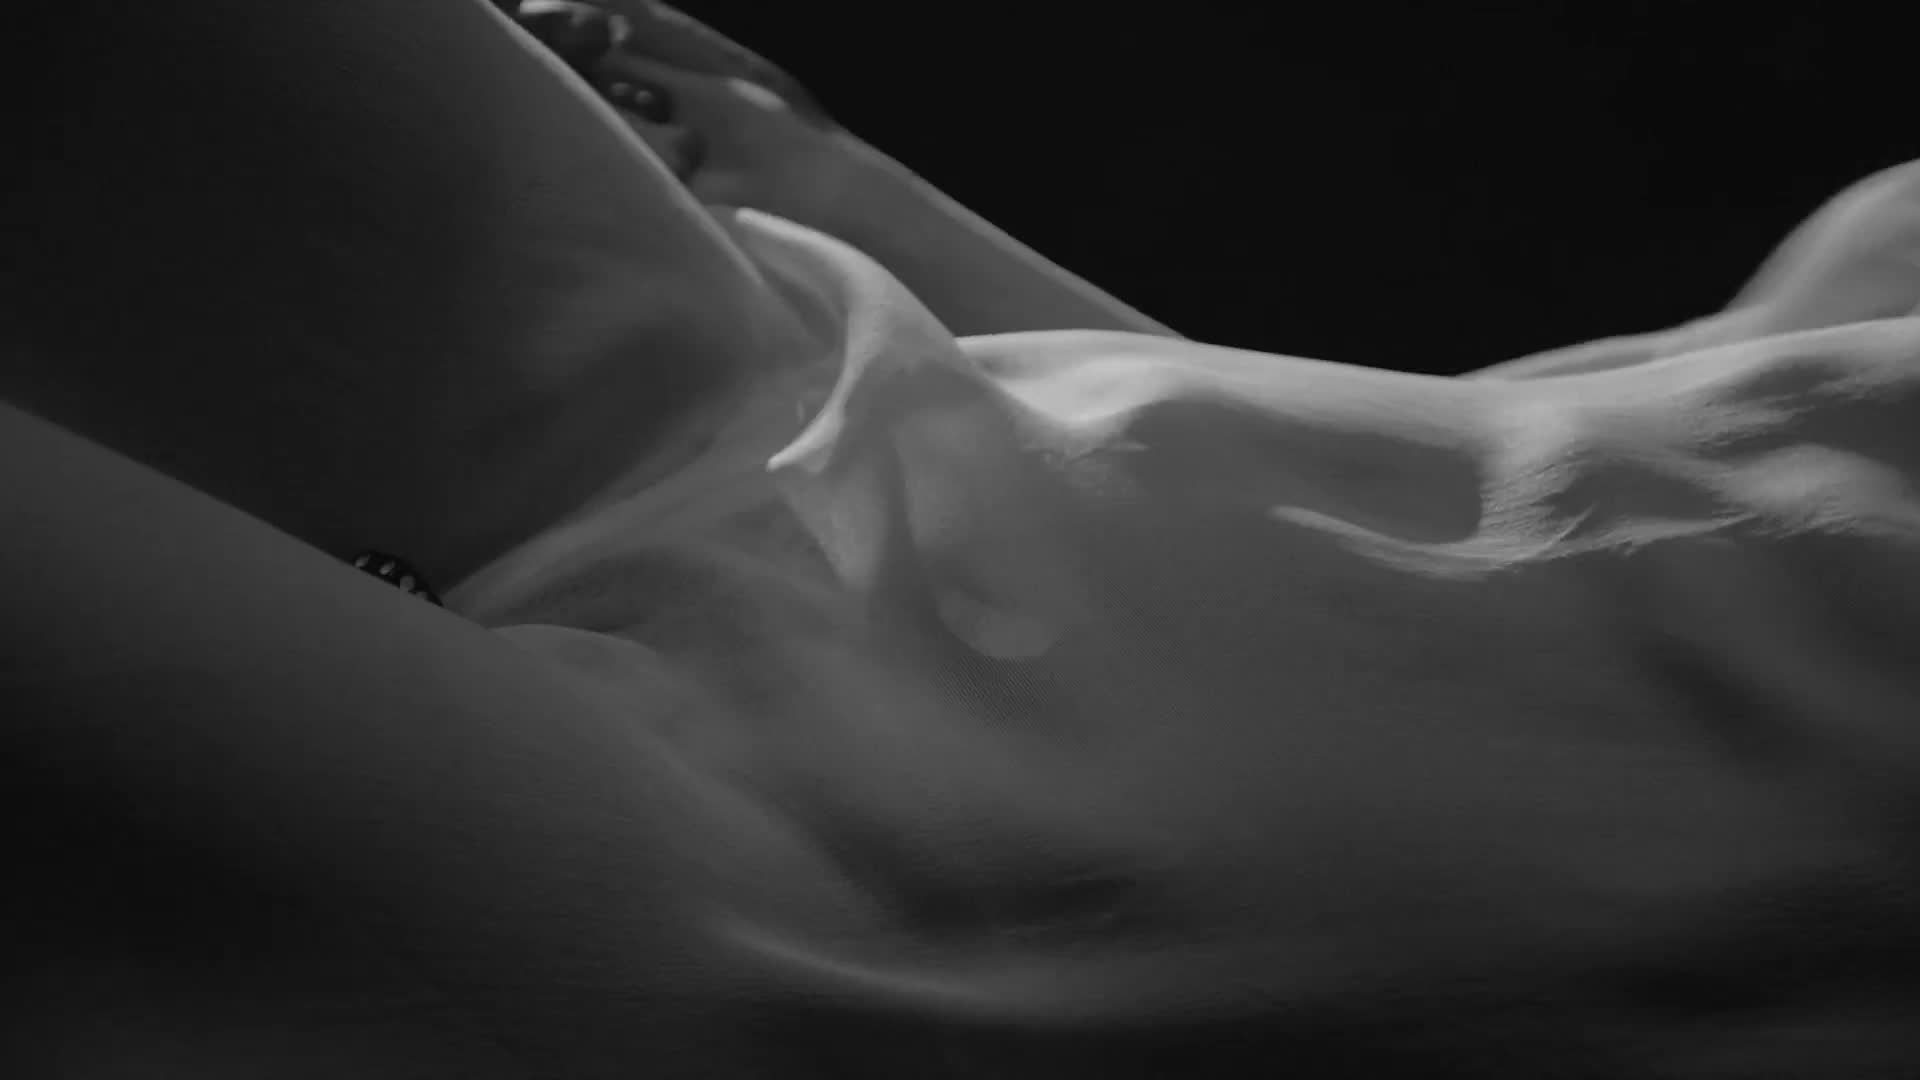 Topless Pics Of Rihanna